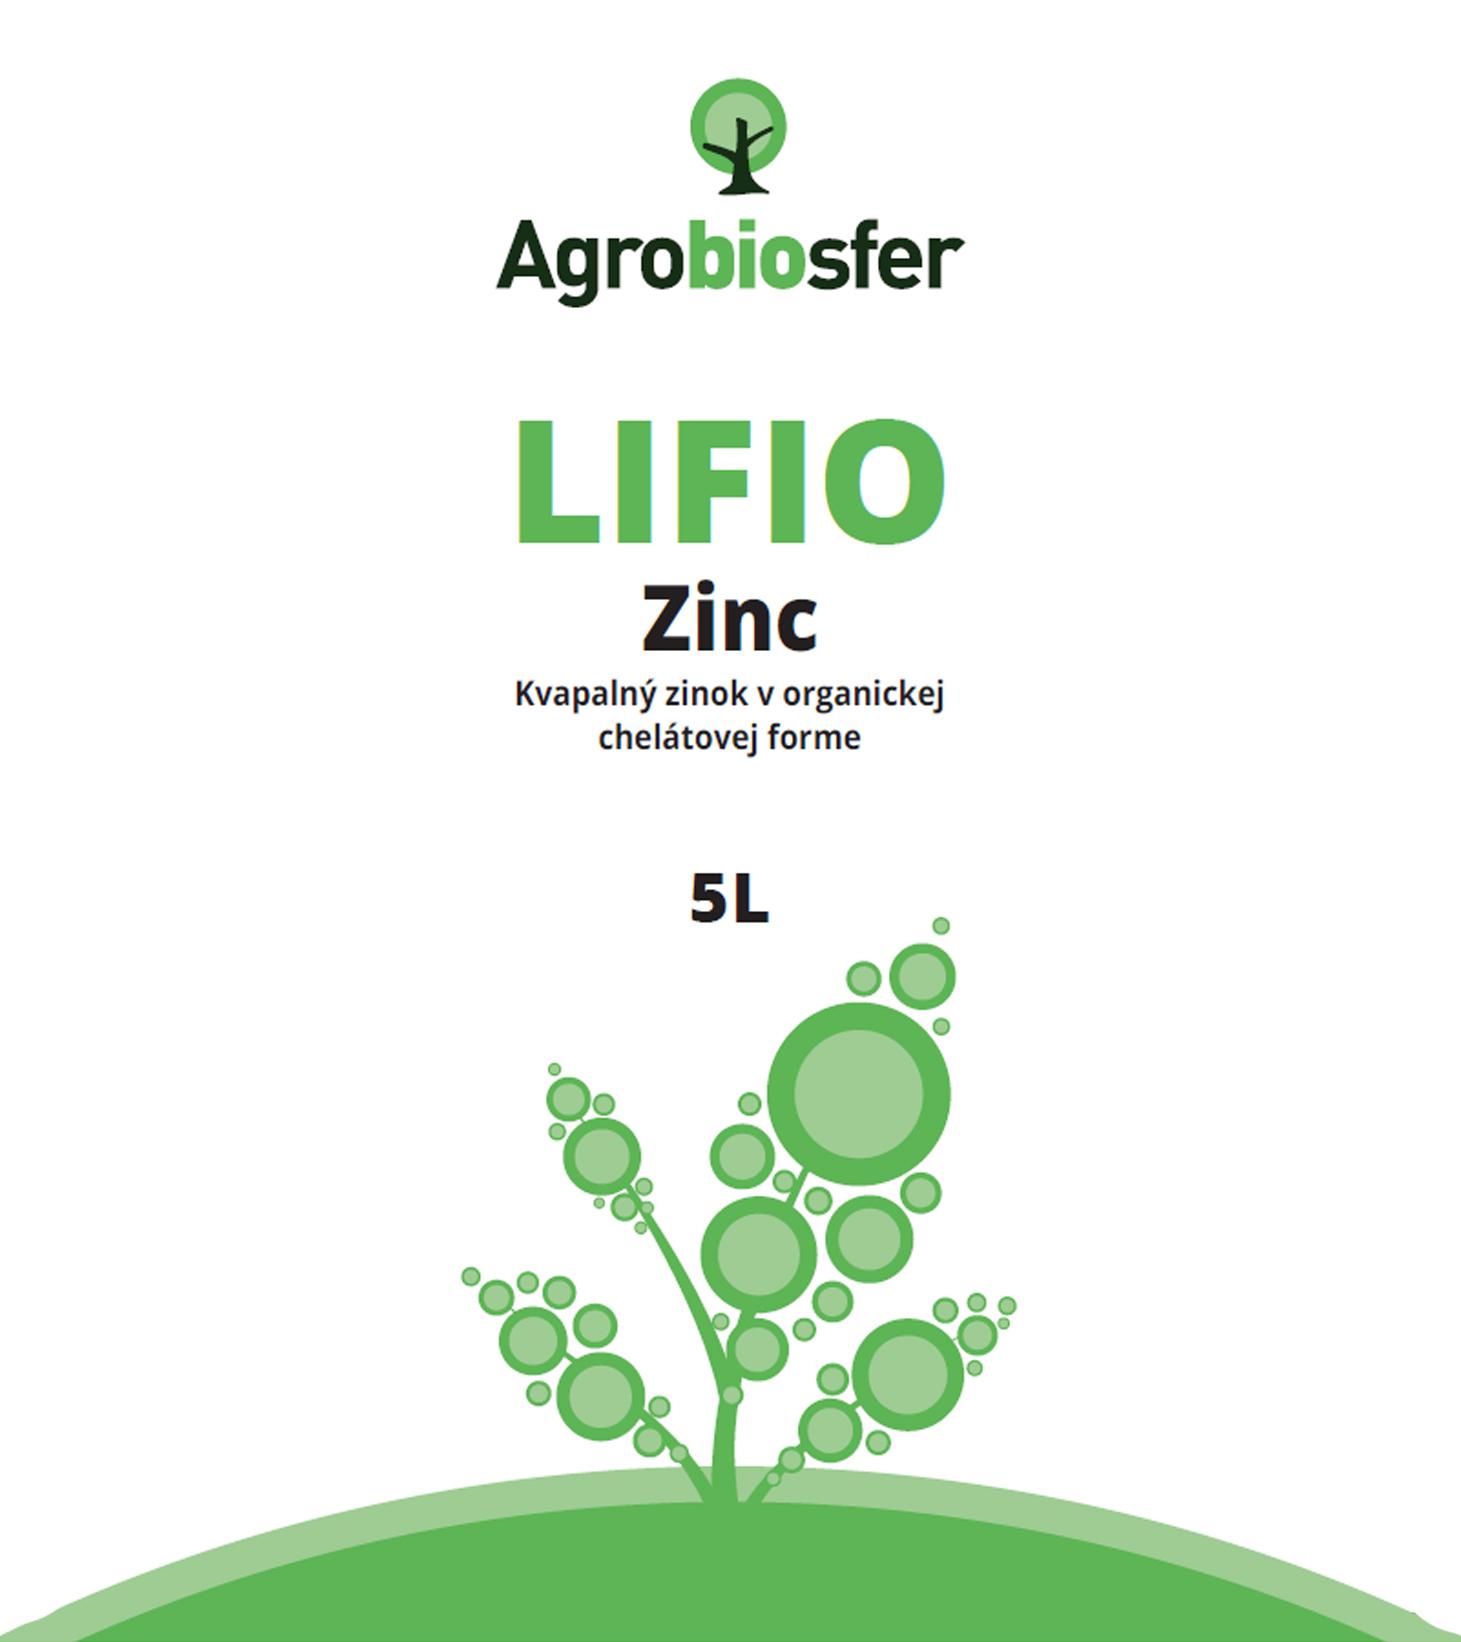 LIFIO Zinc